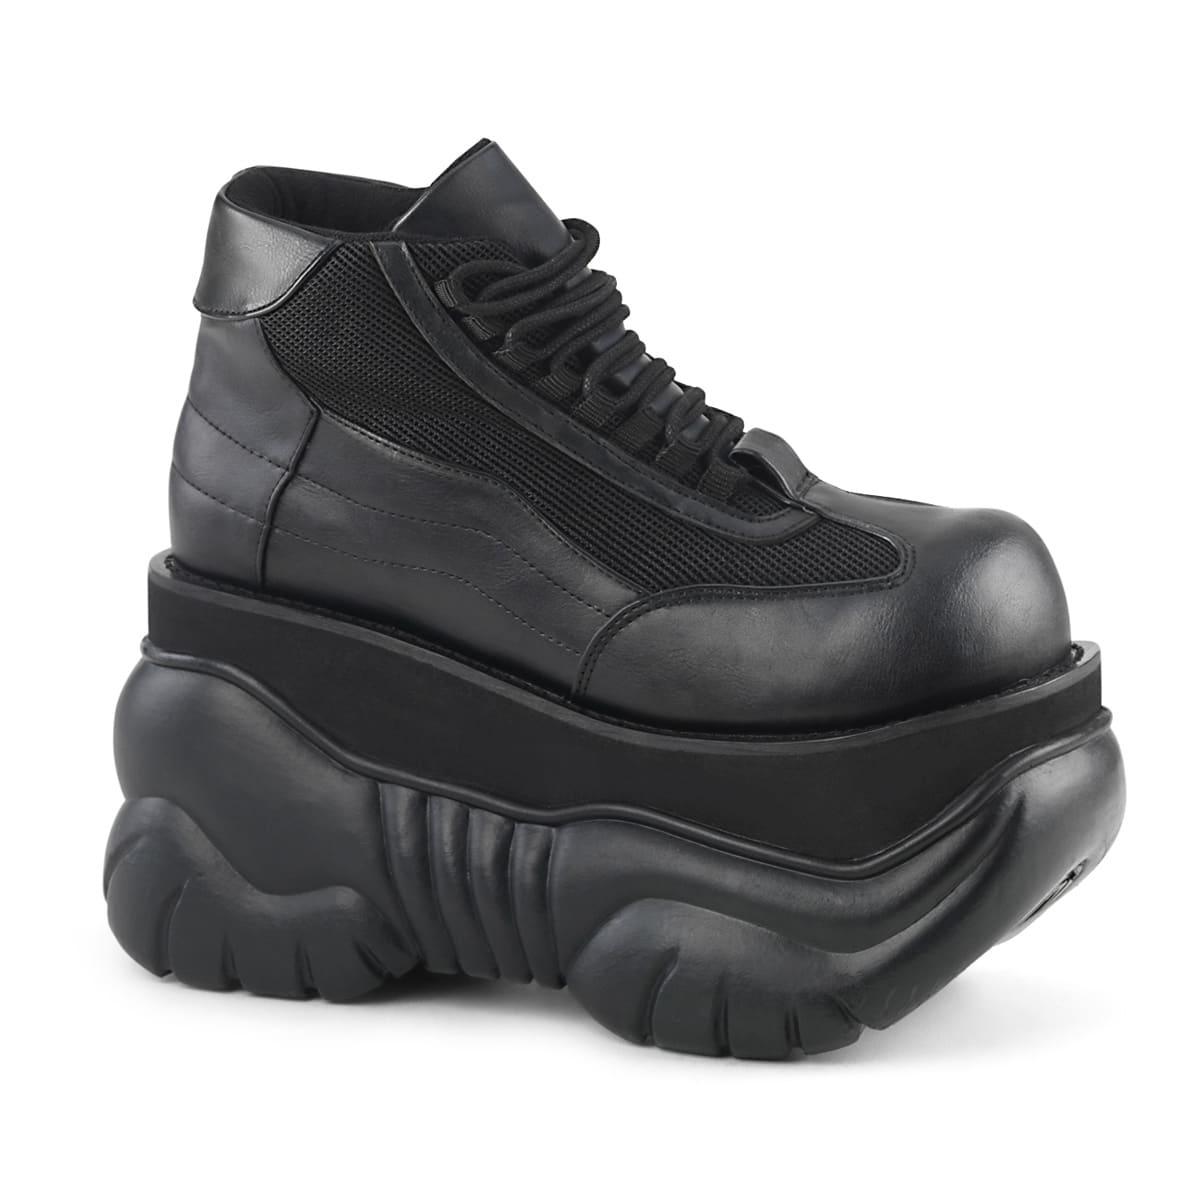 Demonia schoenen